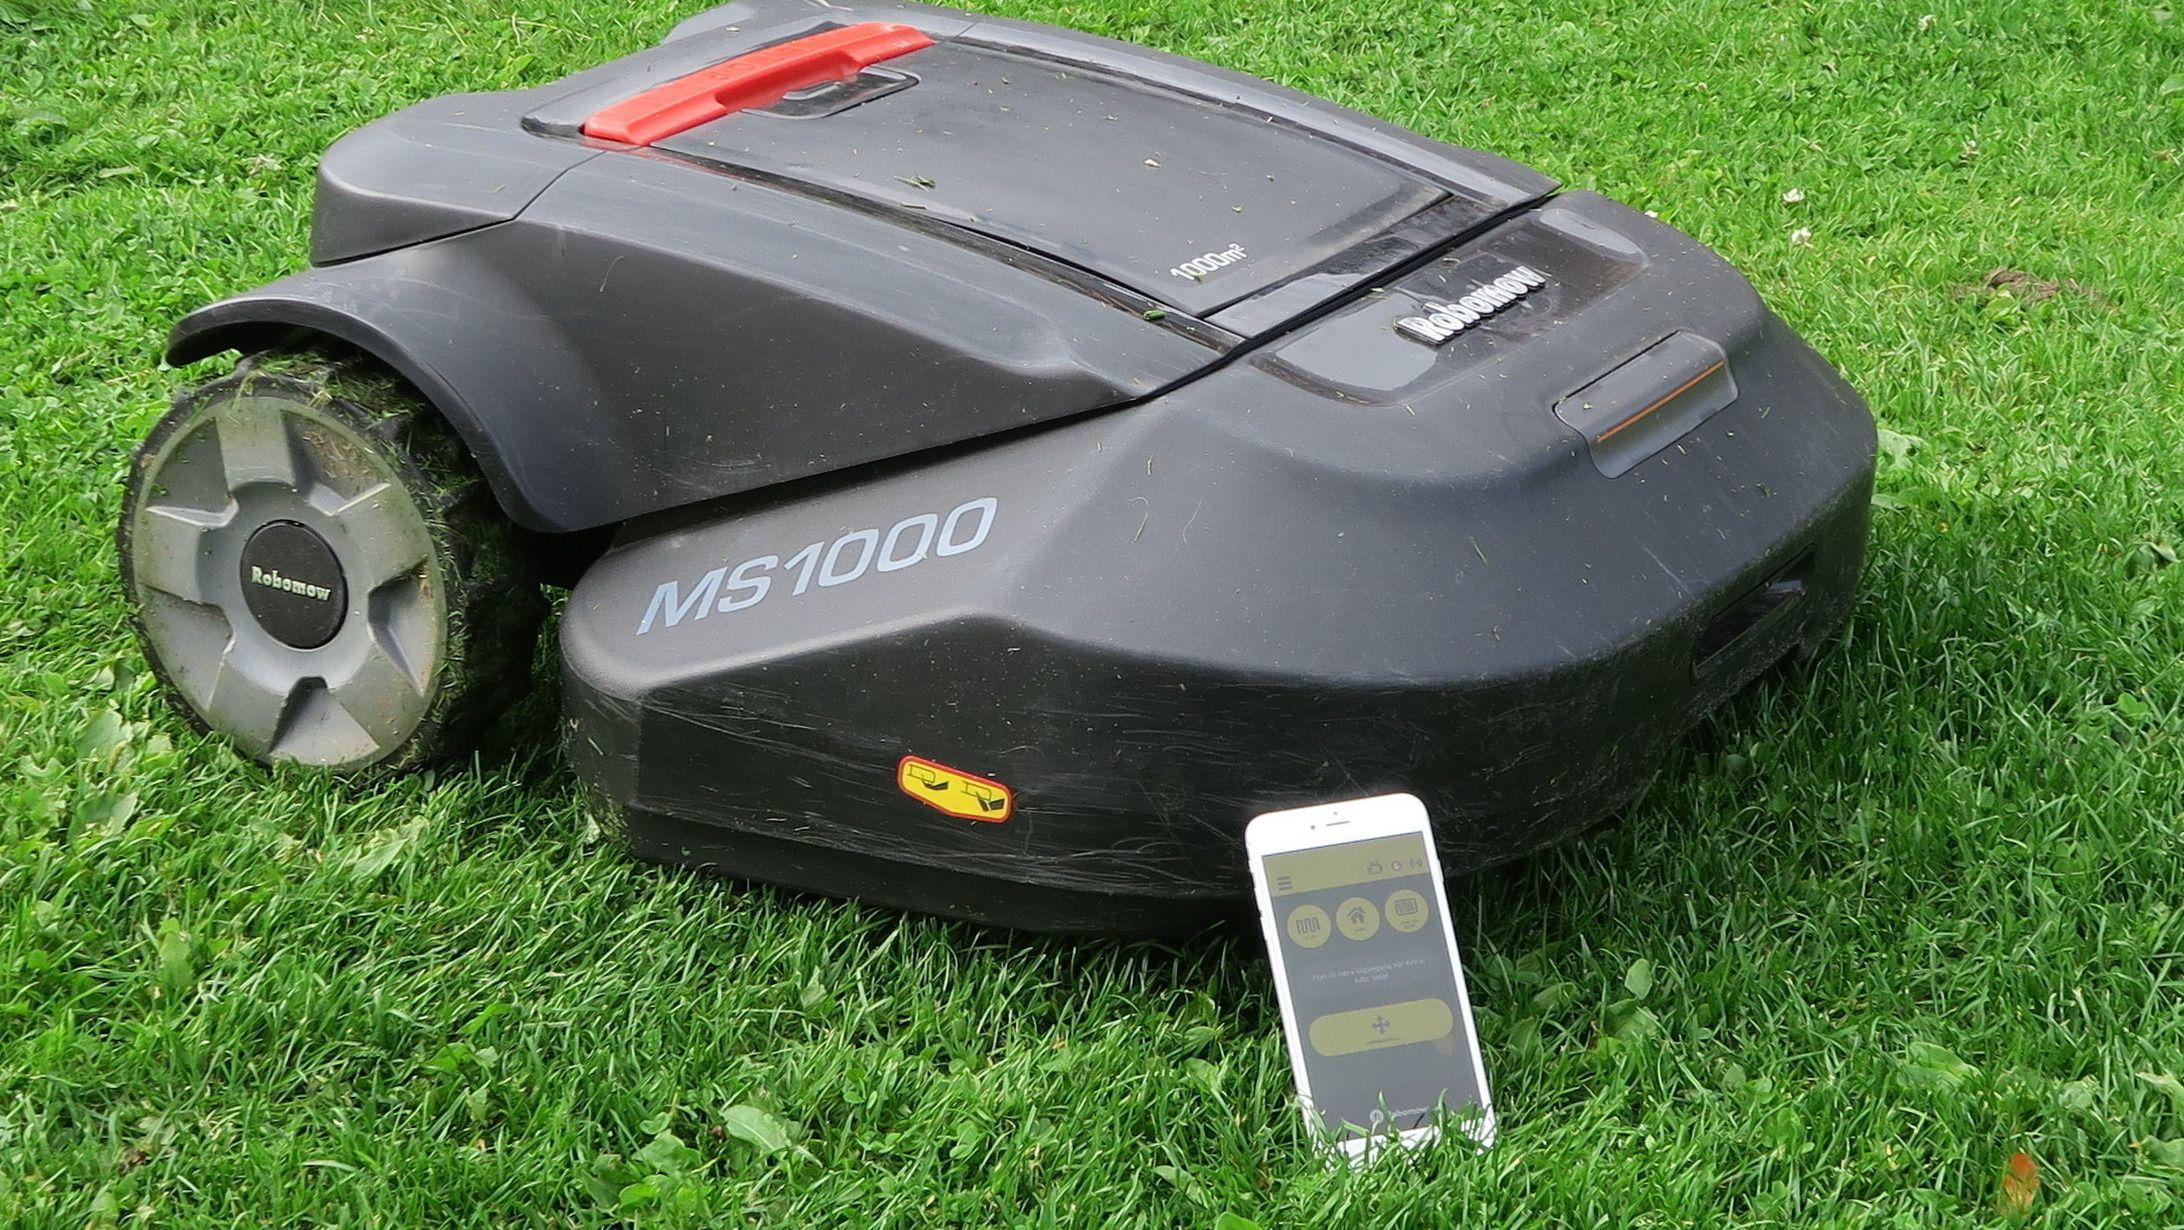 Mange roboter kan konfigureres via en app på mobilen.